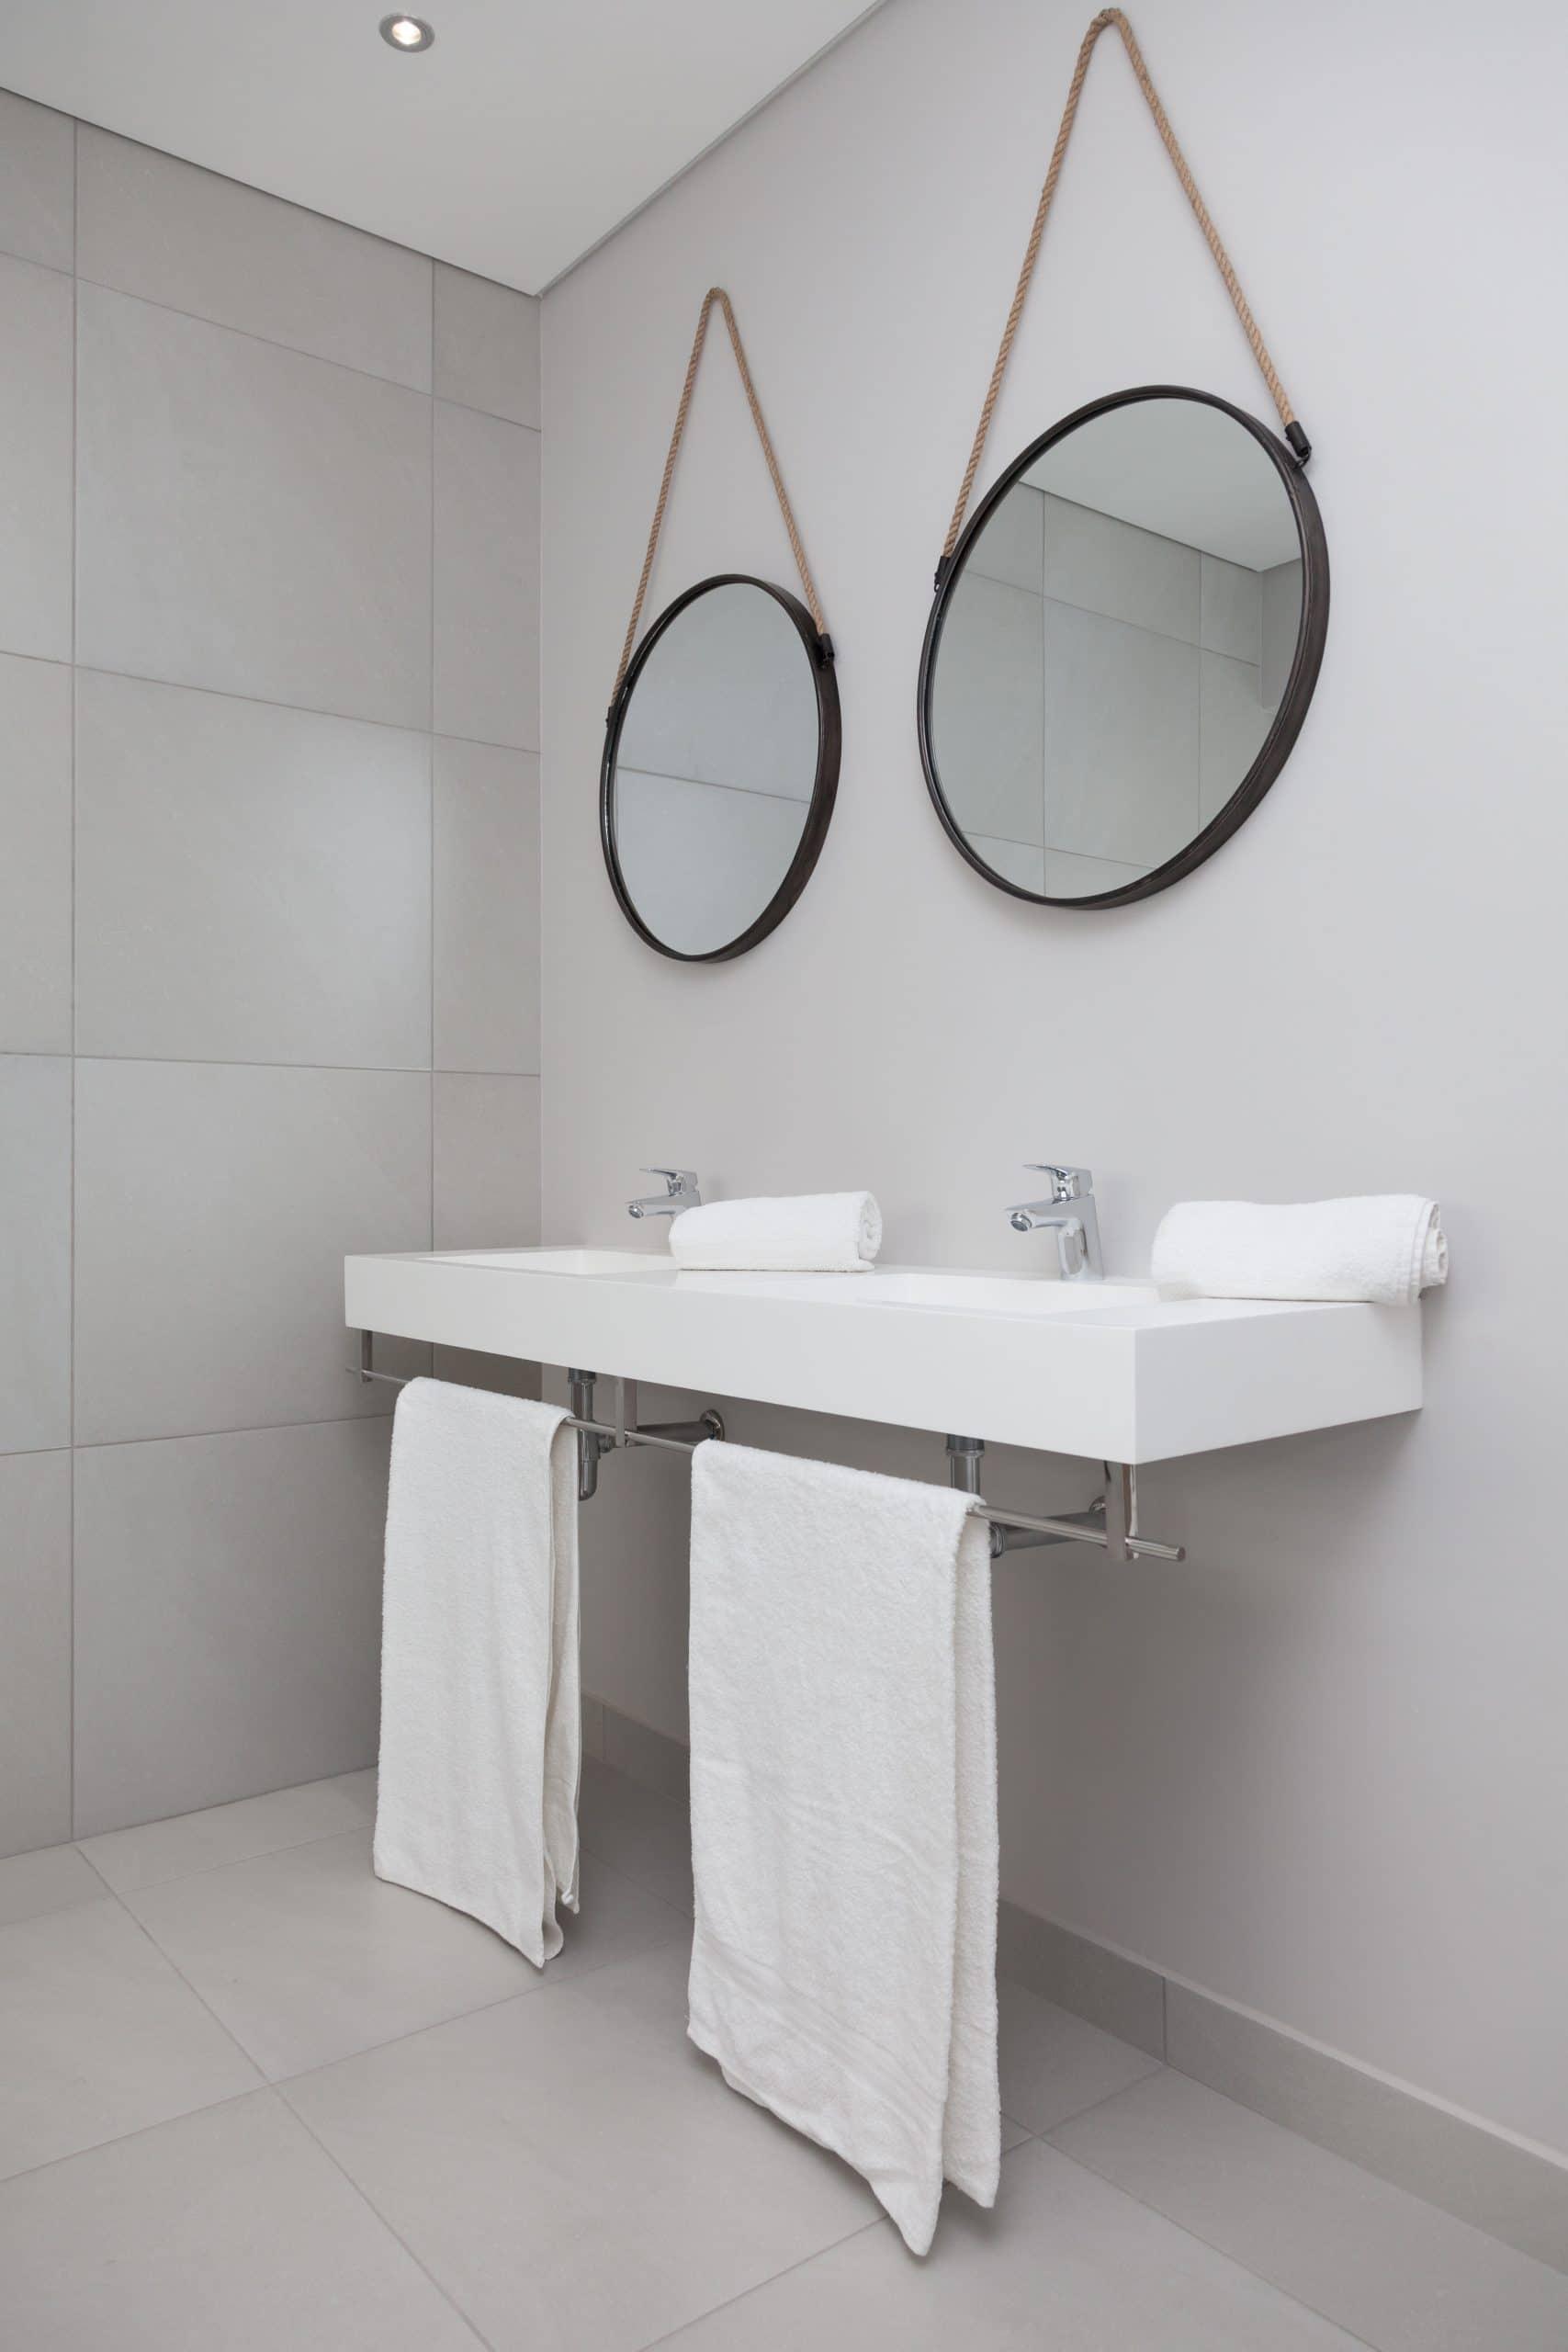 round coricraft hanging mirrors over custom wall hung basin